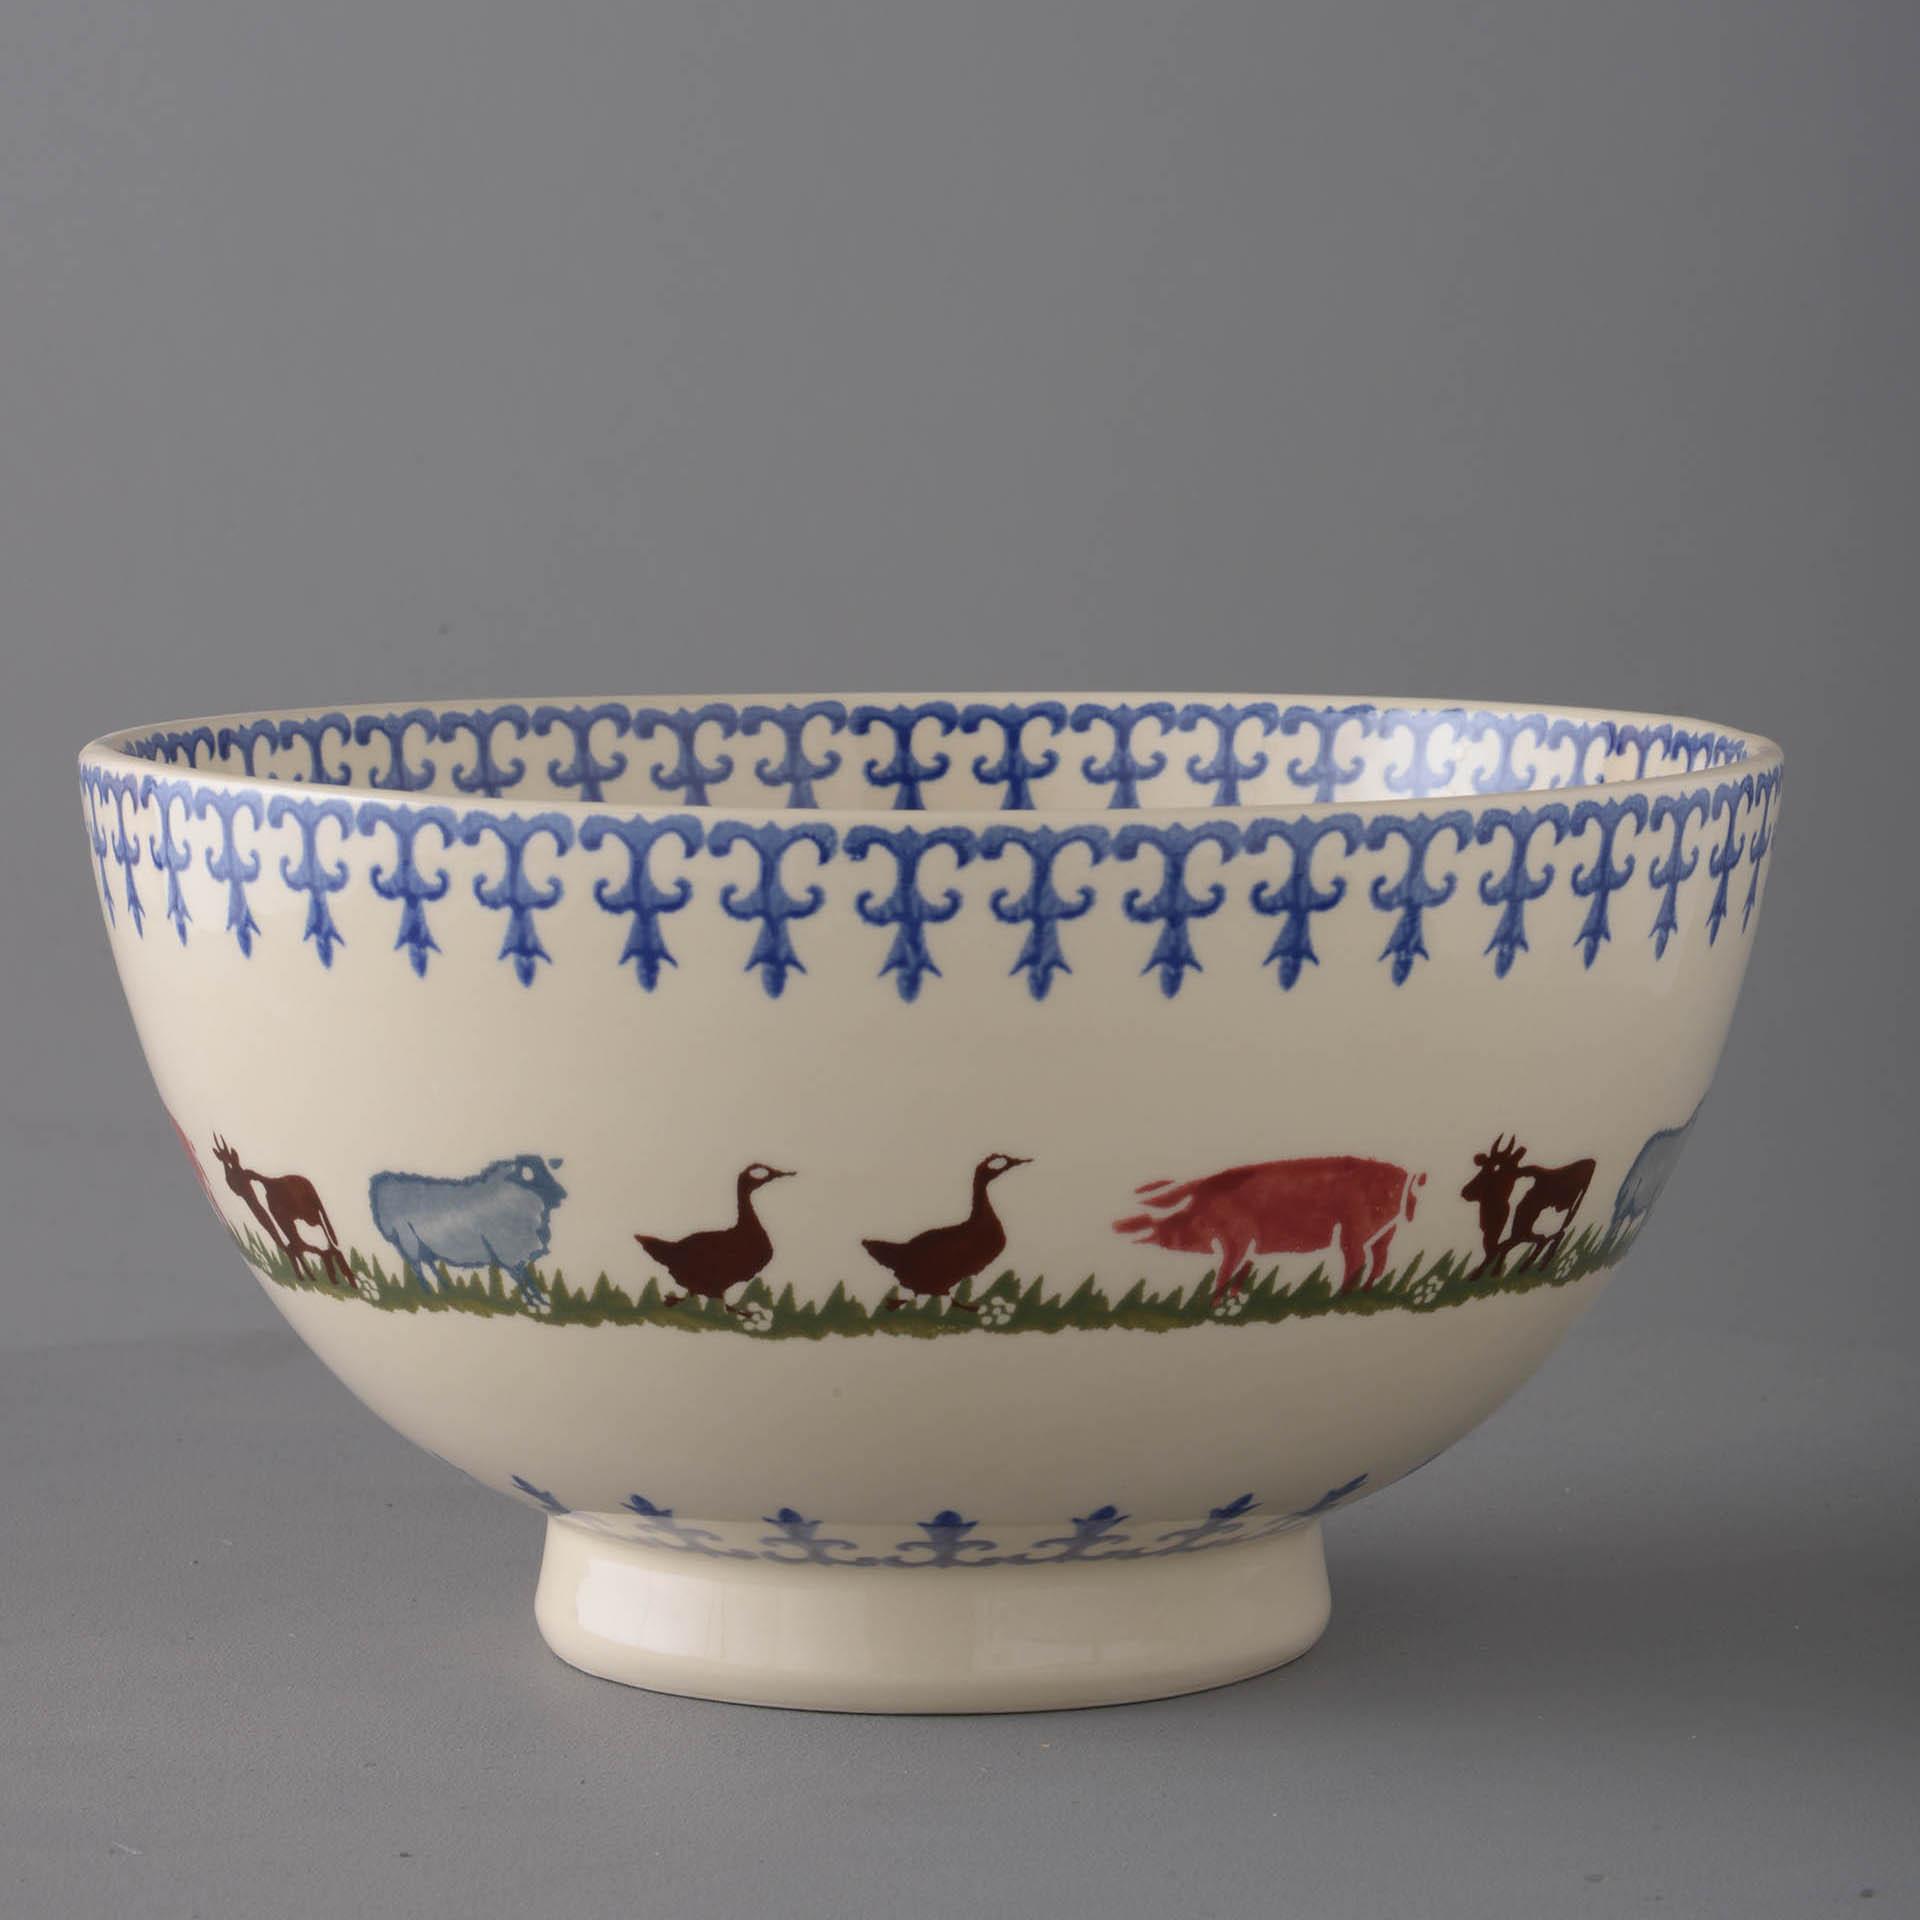 Farm Animals Serving Bowl 11 x 21.5cm